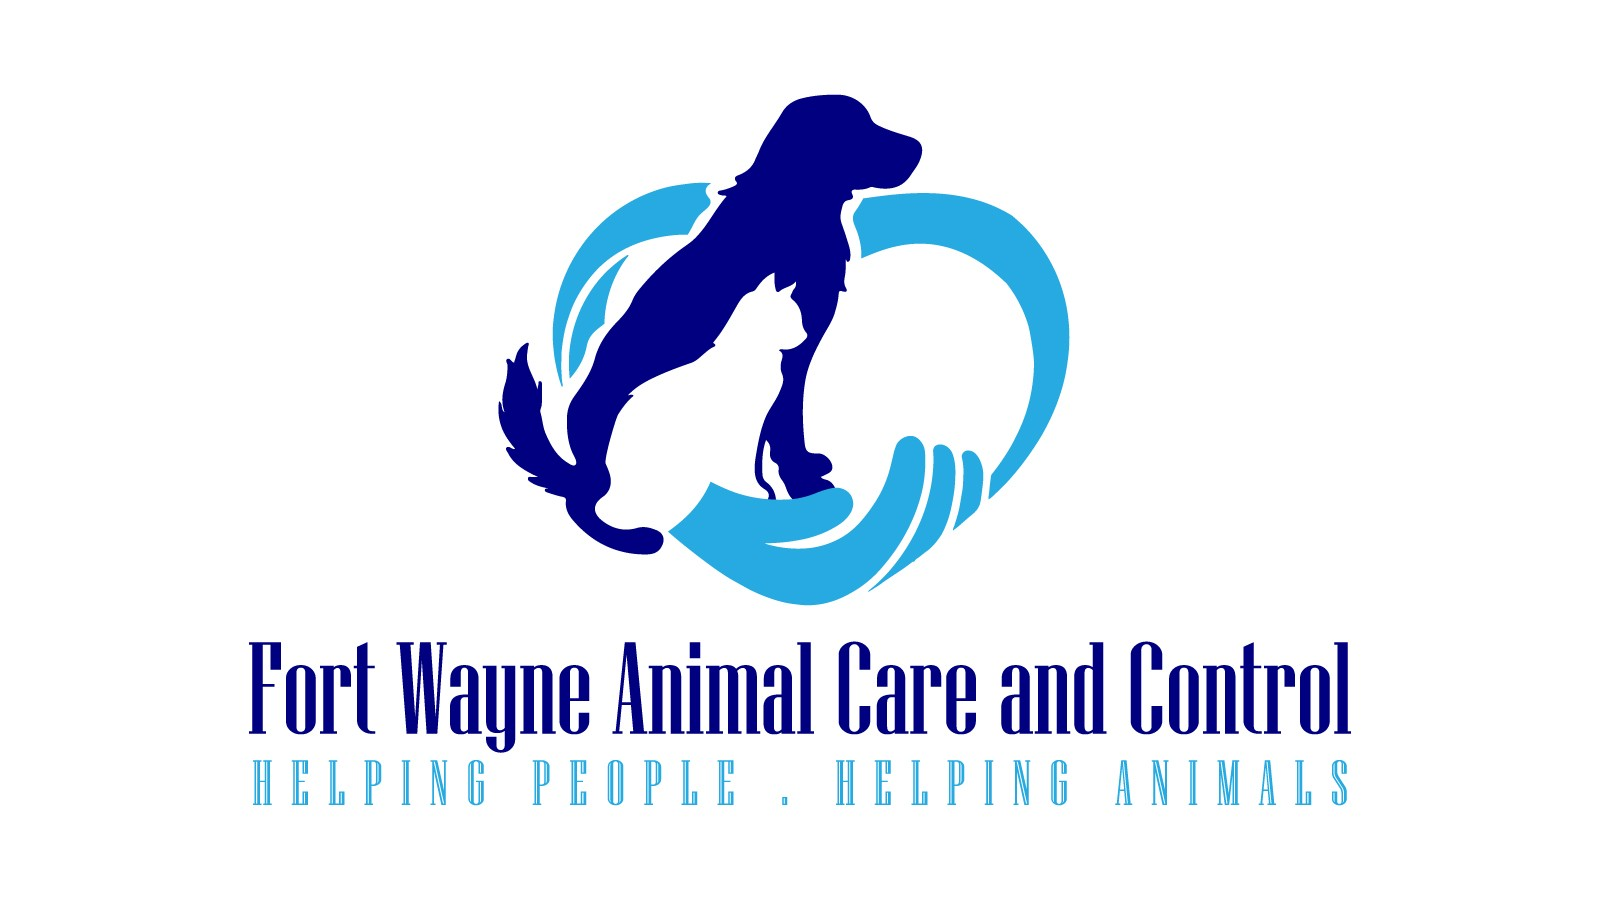 Fort Wayne Animal Care and Control Logo